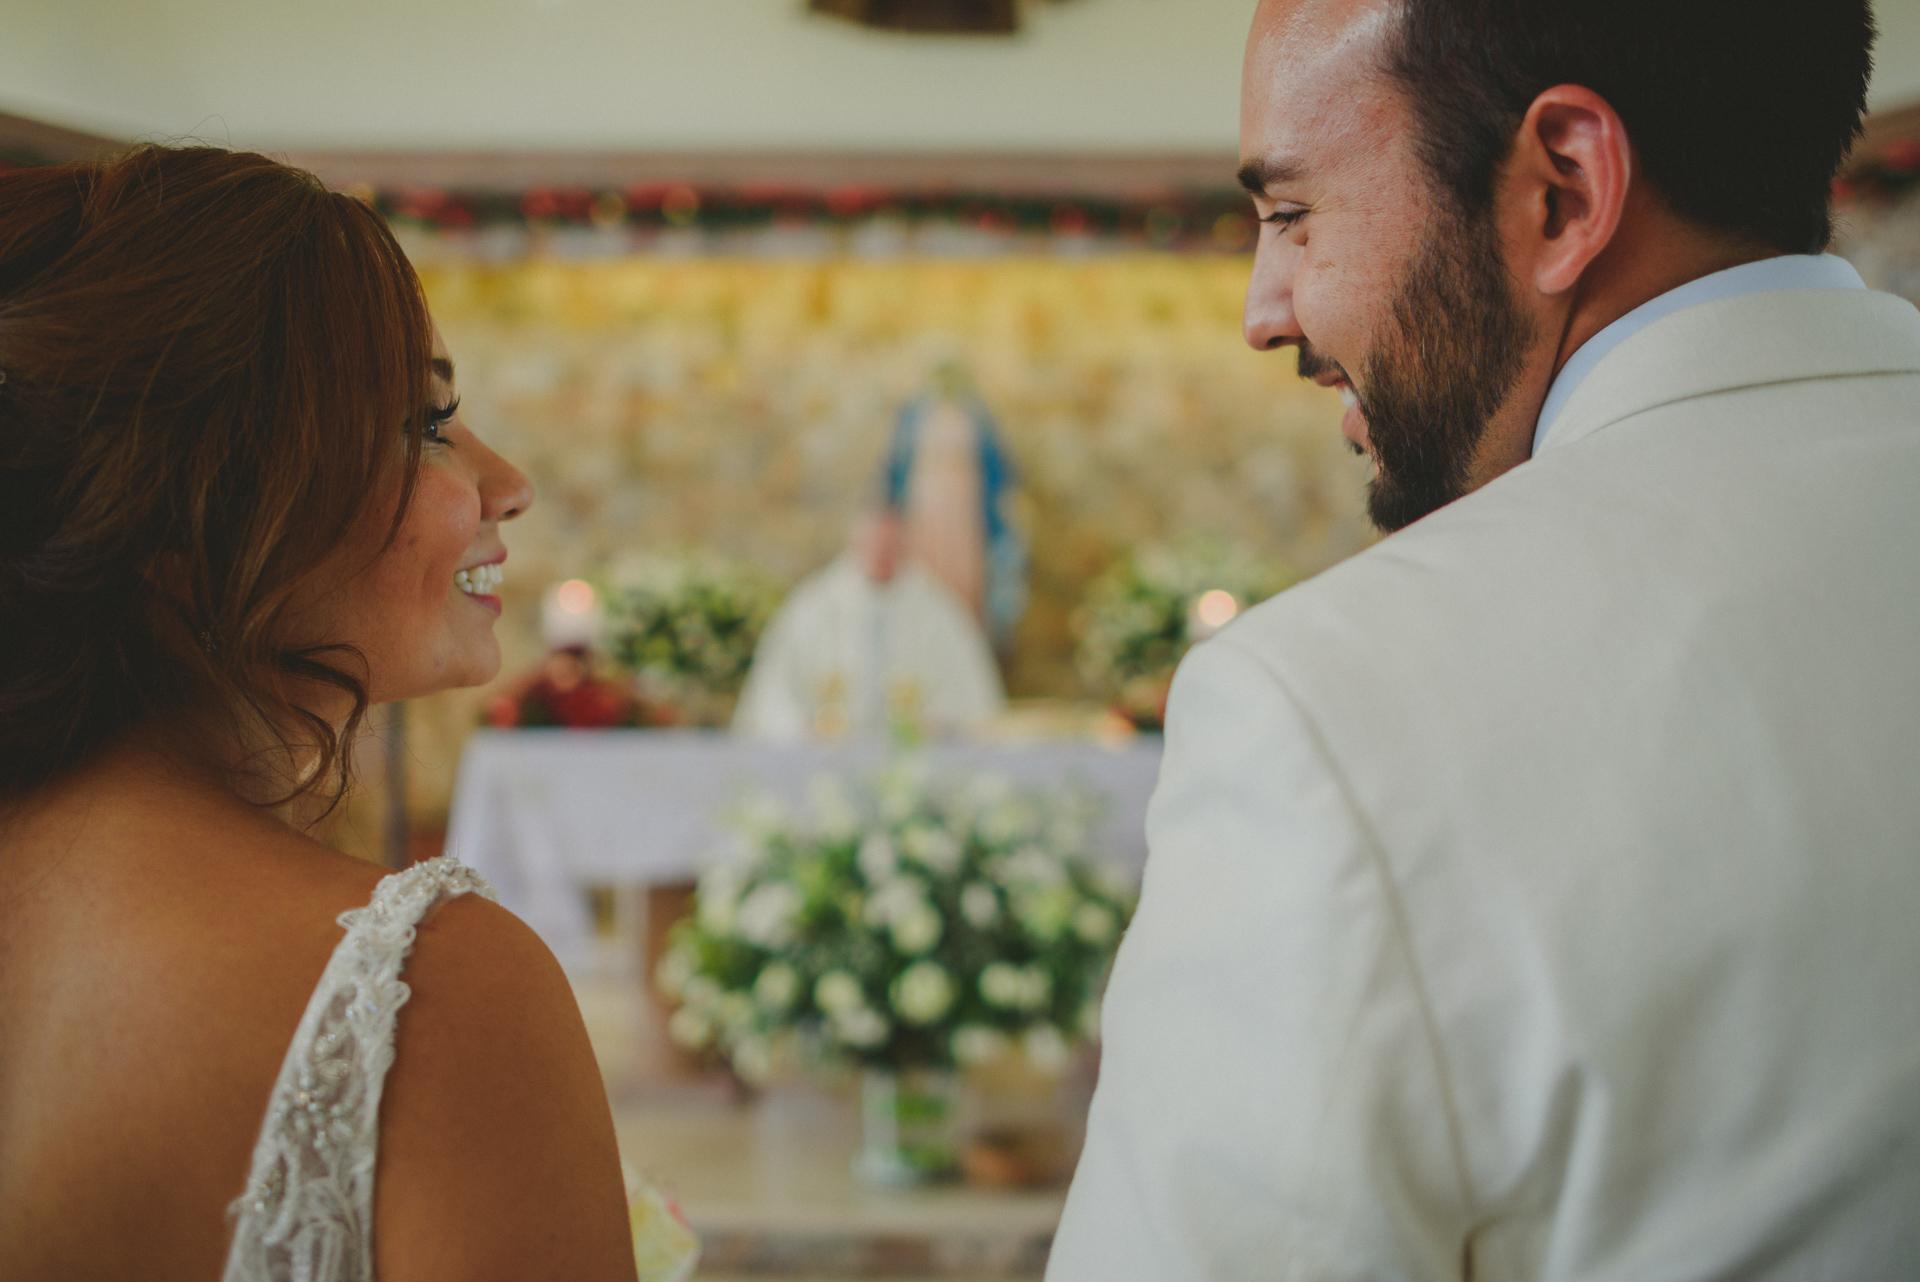 Wedding N&M BLOG luishoudin.com (61 de 174)